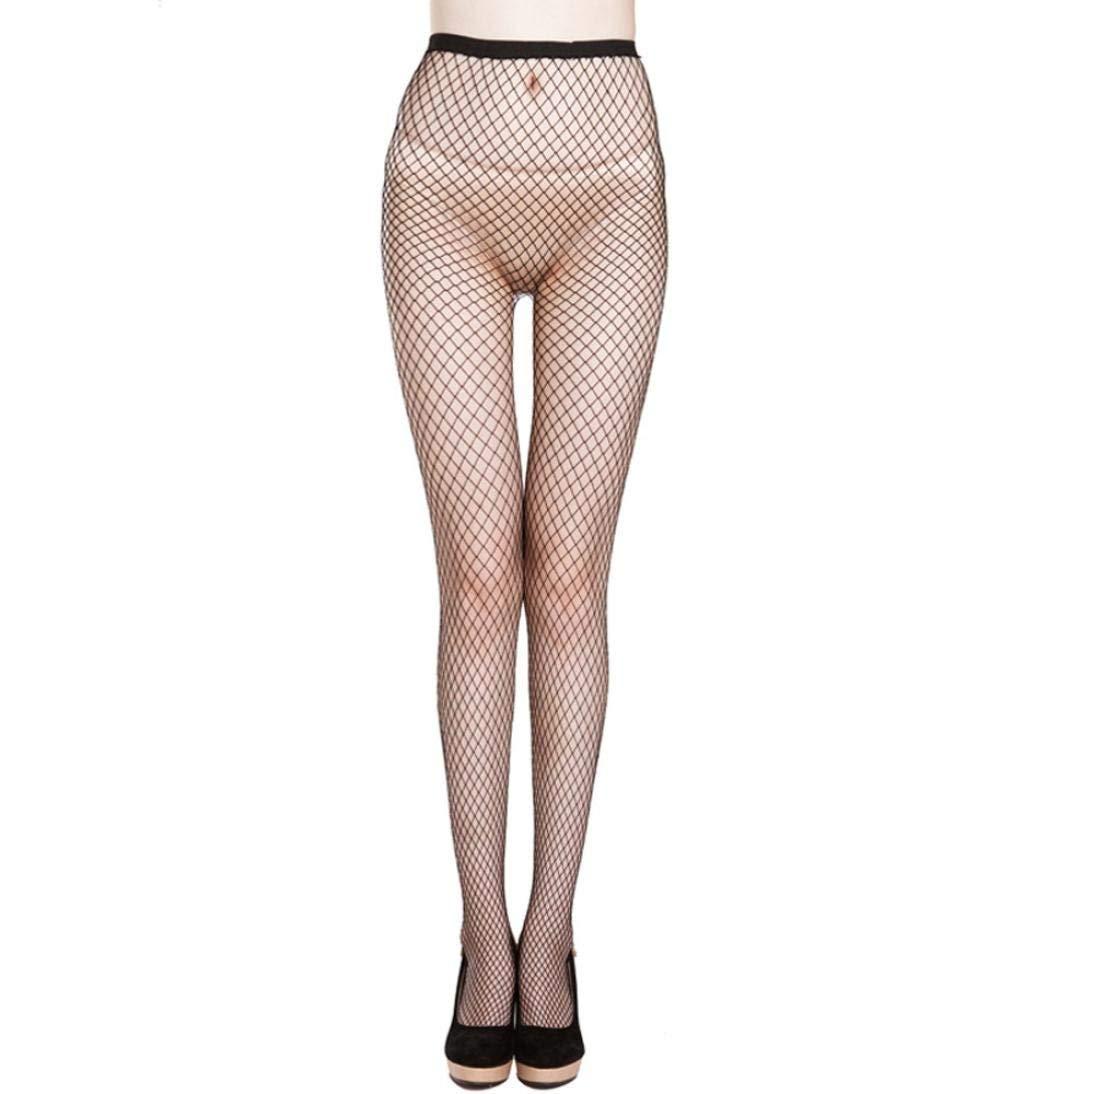 NEWONESUN-Socks Stockings,NEWONESUN Women Sexy Lace Thigh Stocking Elastic Pantyhose Socks (Black)